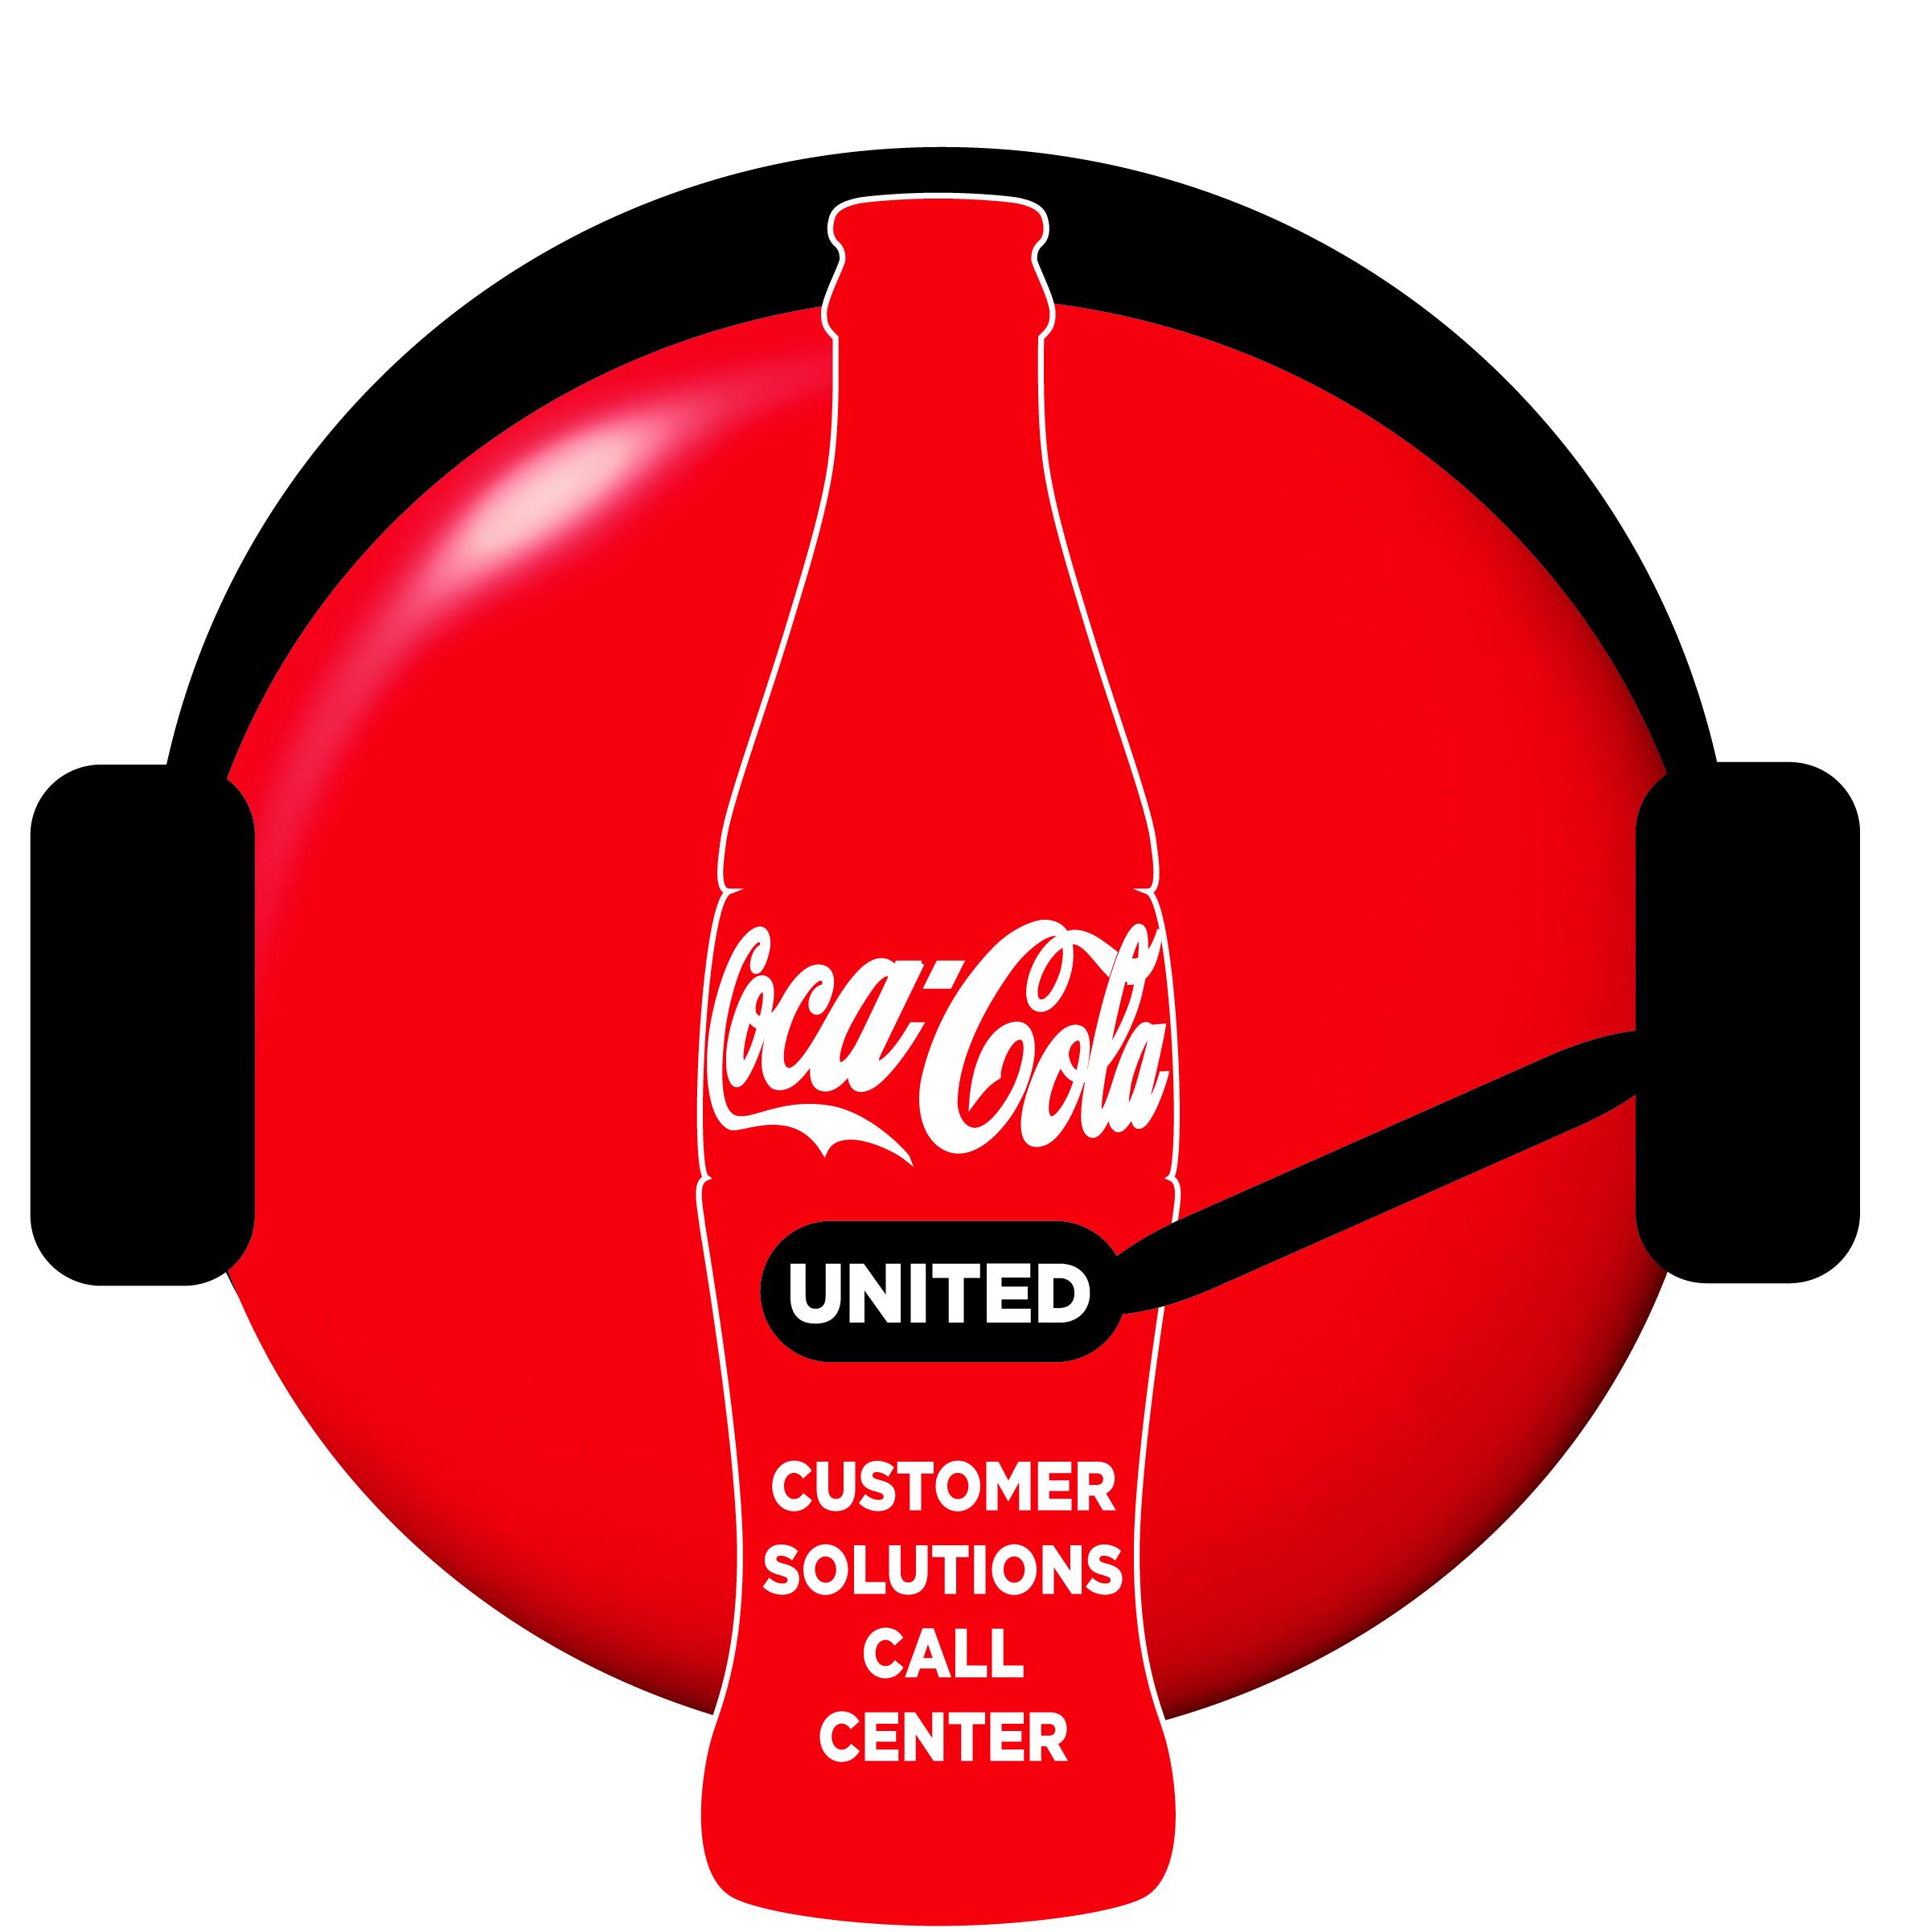 CCU Customer Solutions Call Center Logo